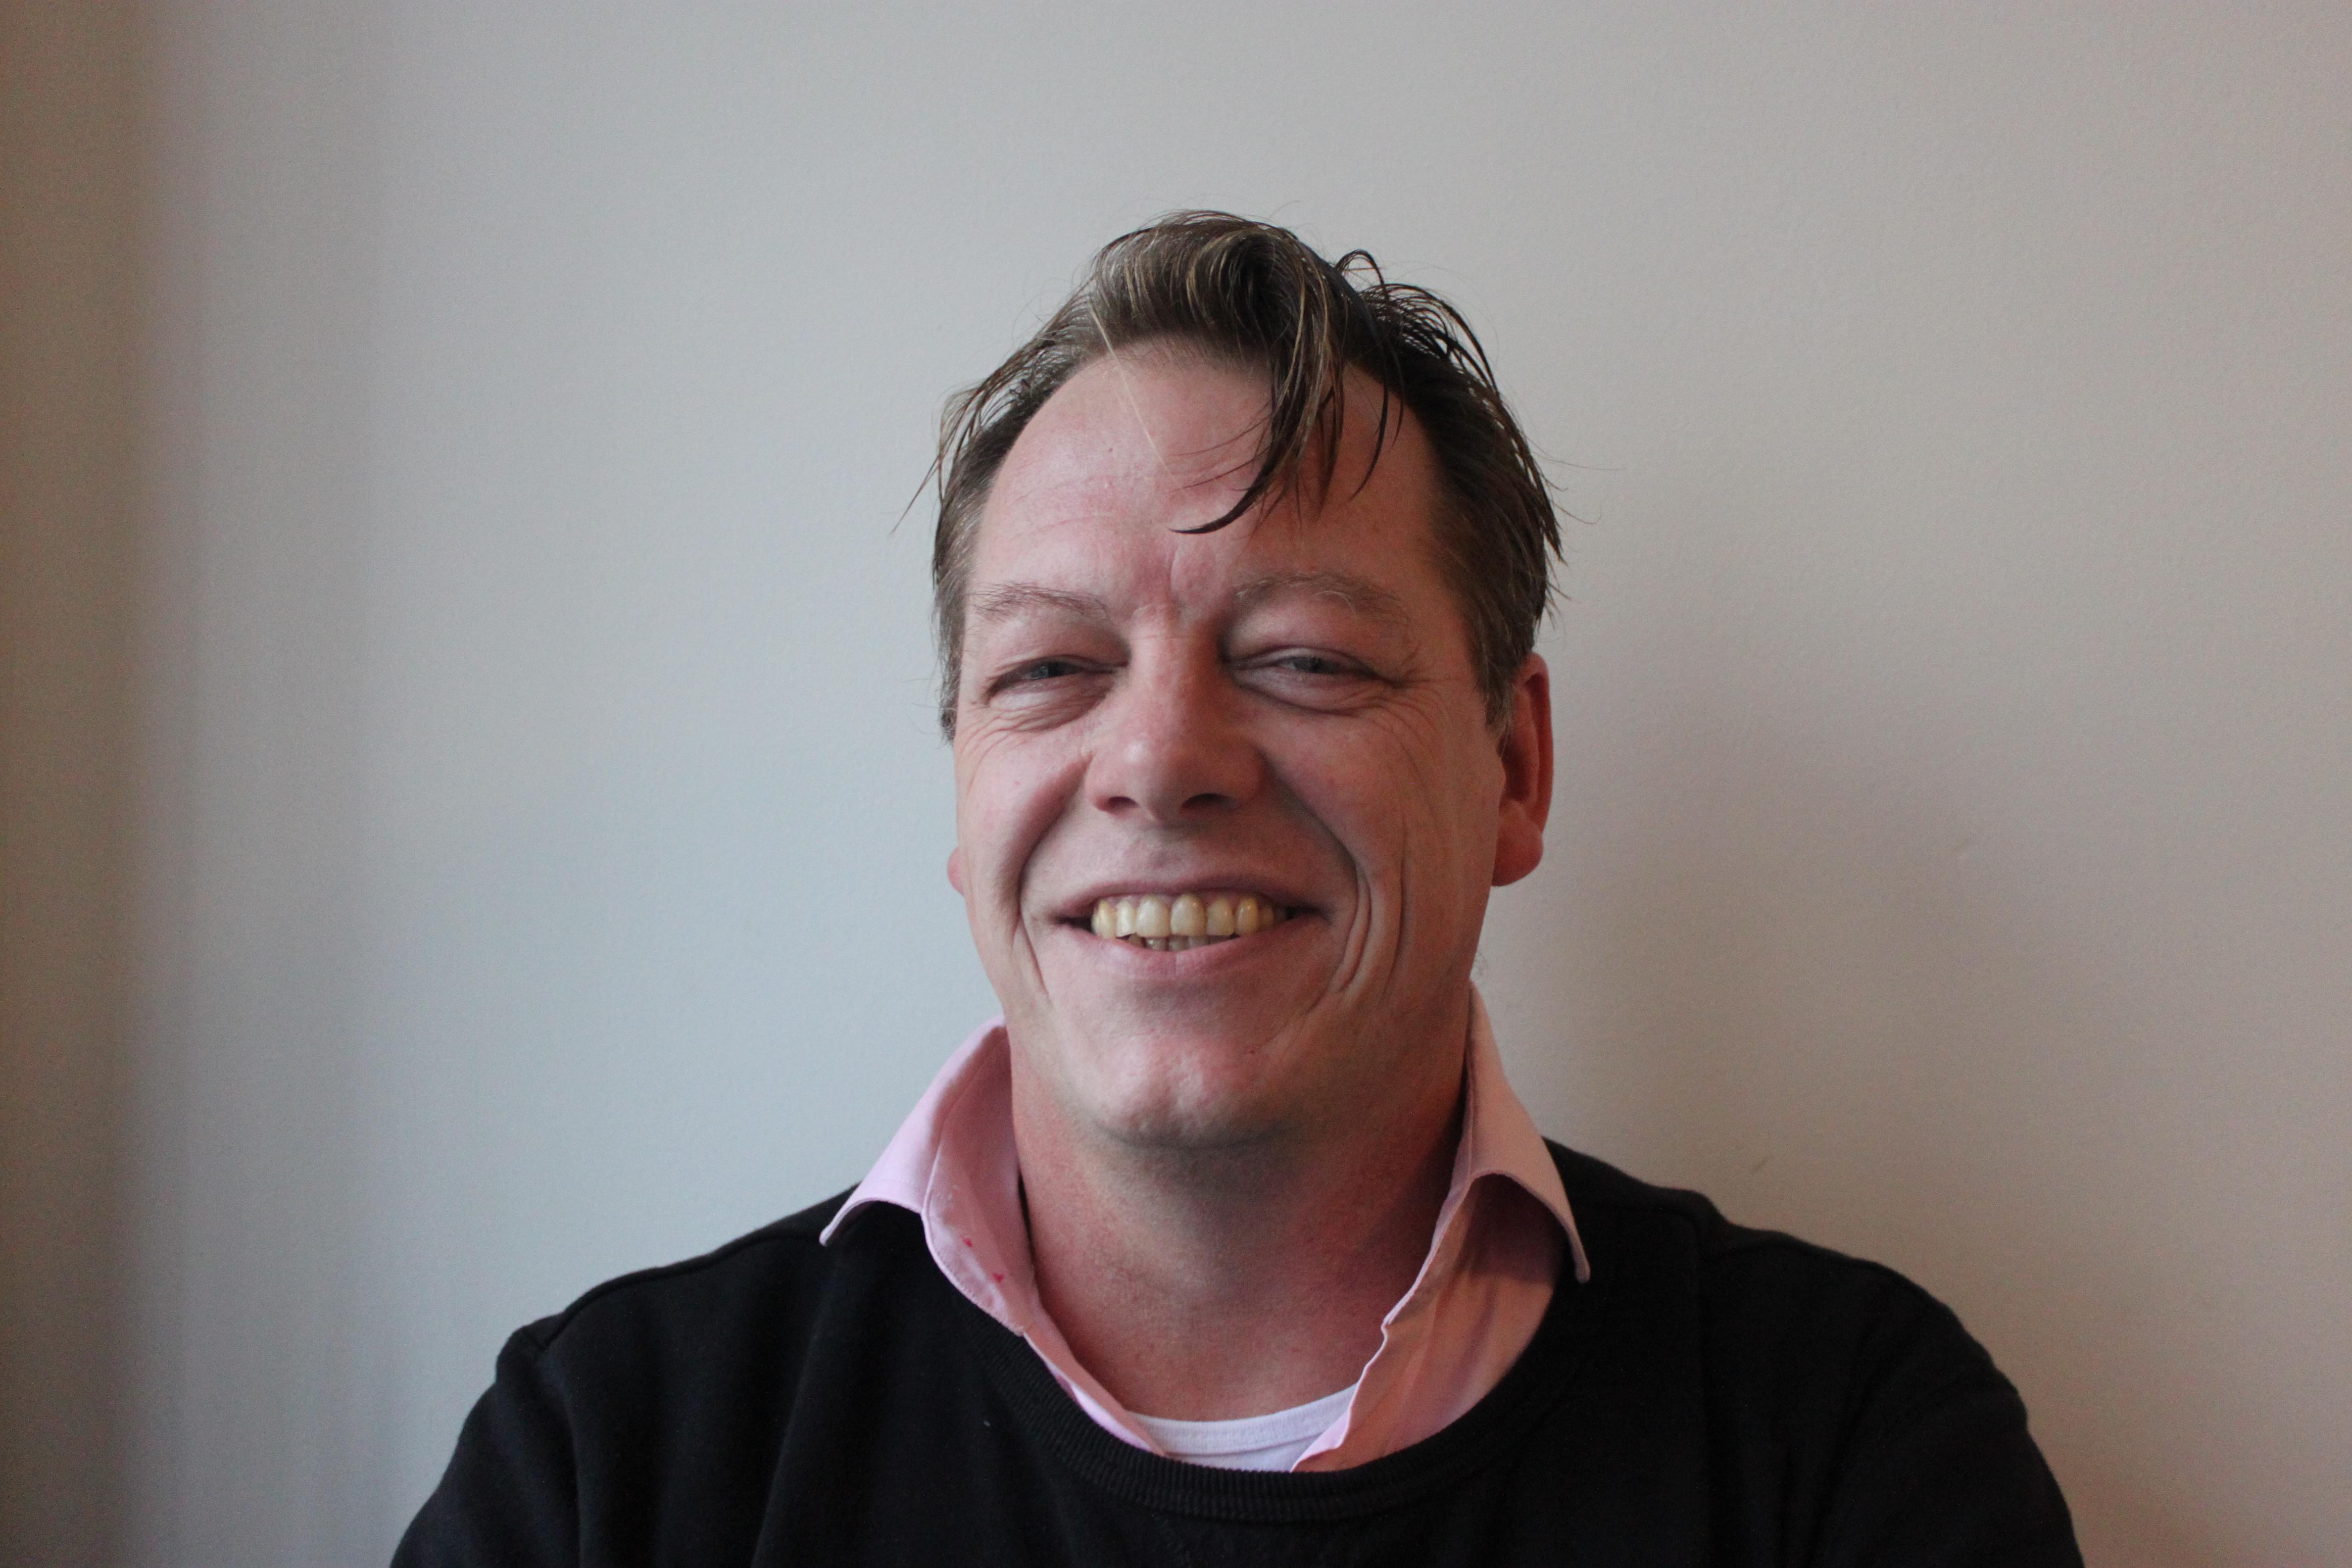 Mark van Harreveld